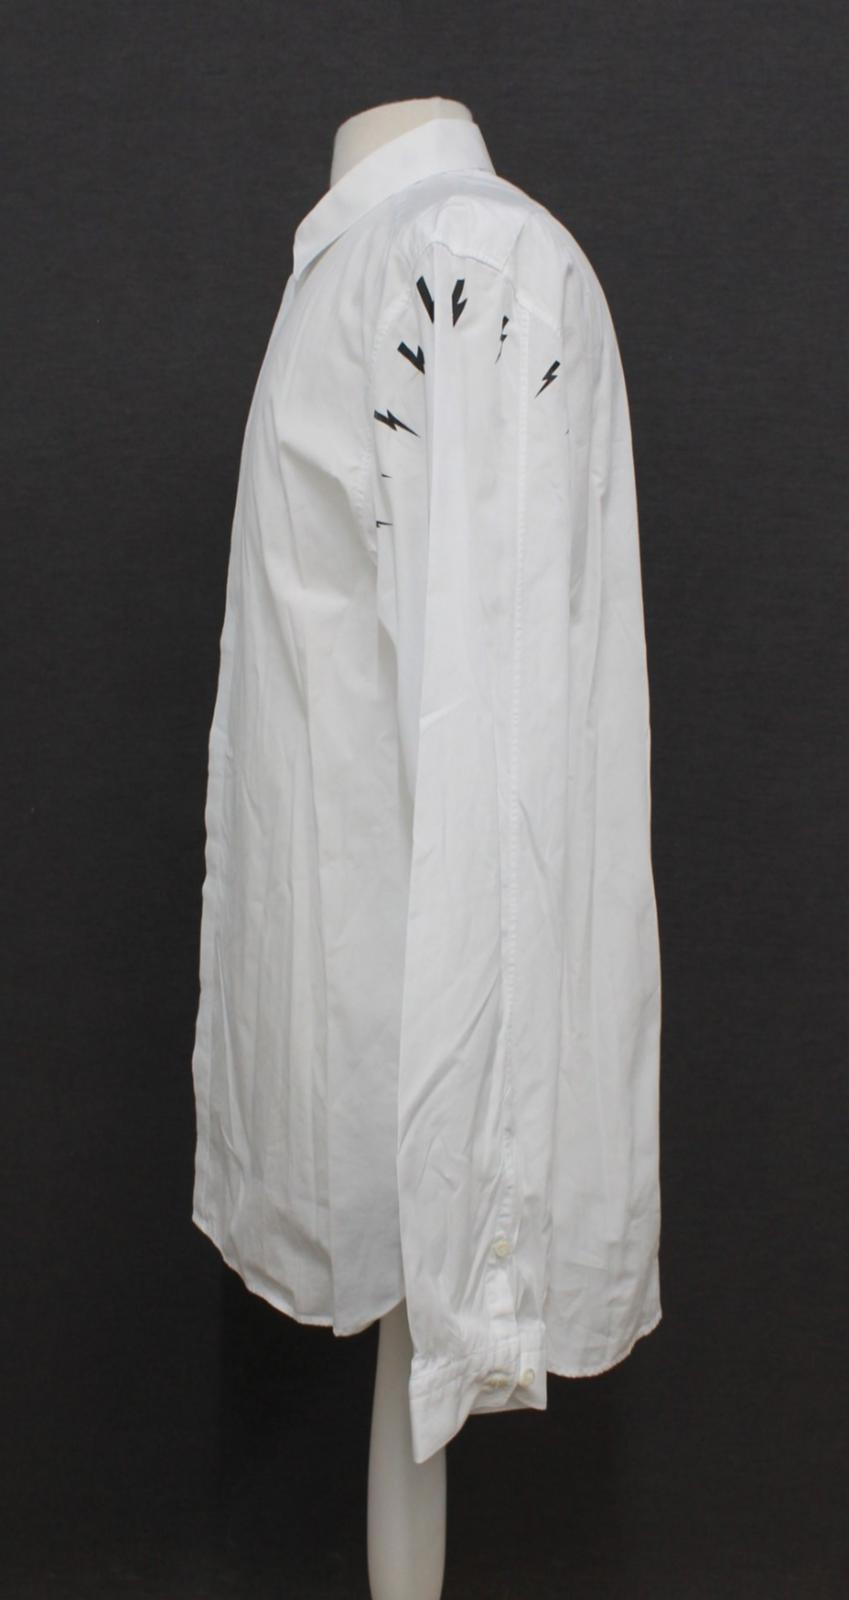 Neil-barrett-hombre-blanco-de-algodon-manga-de-Rayo-con-cuello-camisa-tamano-17-5-034 miniatura 6